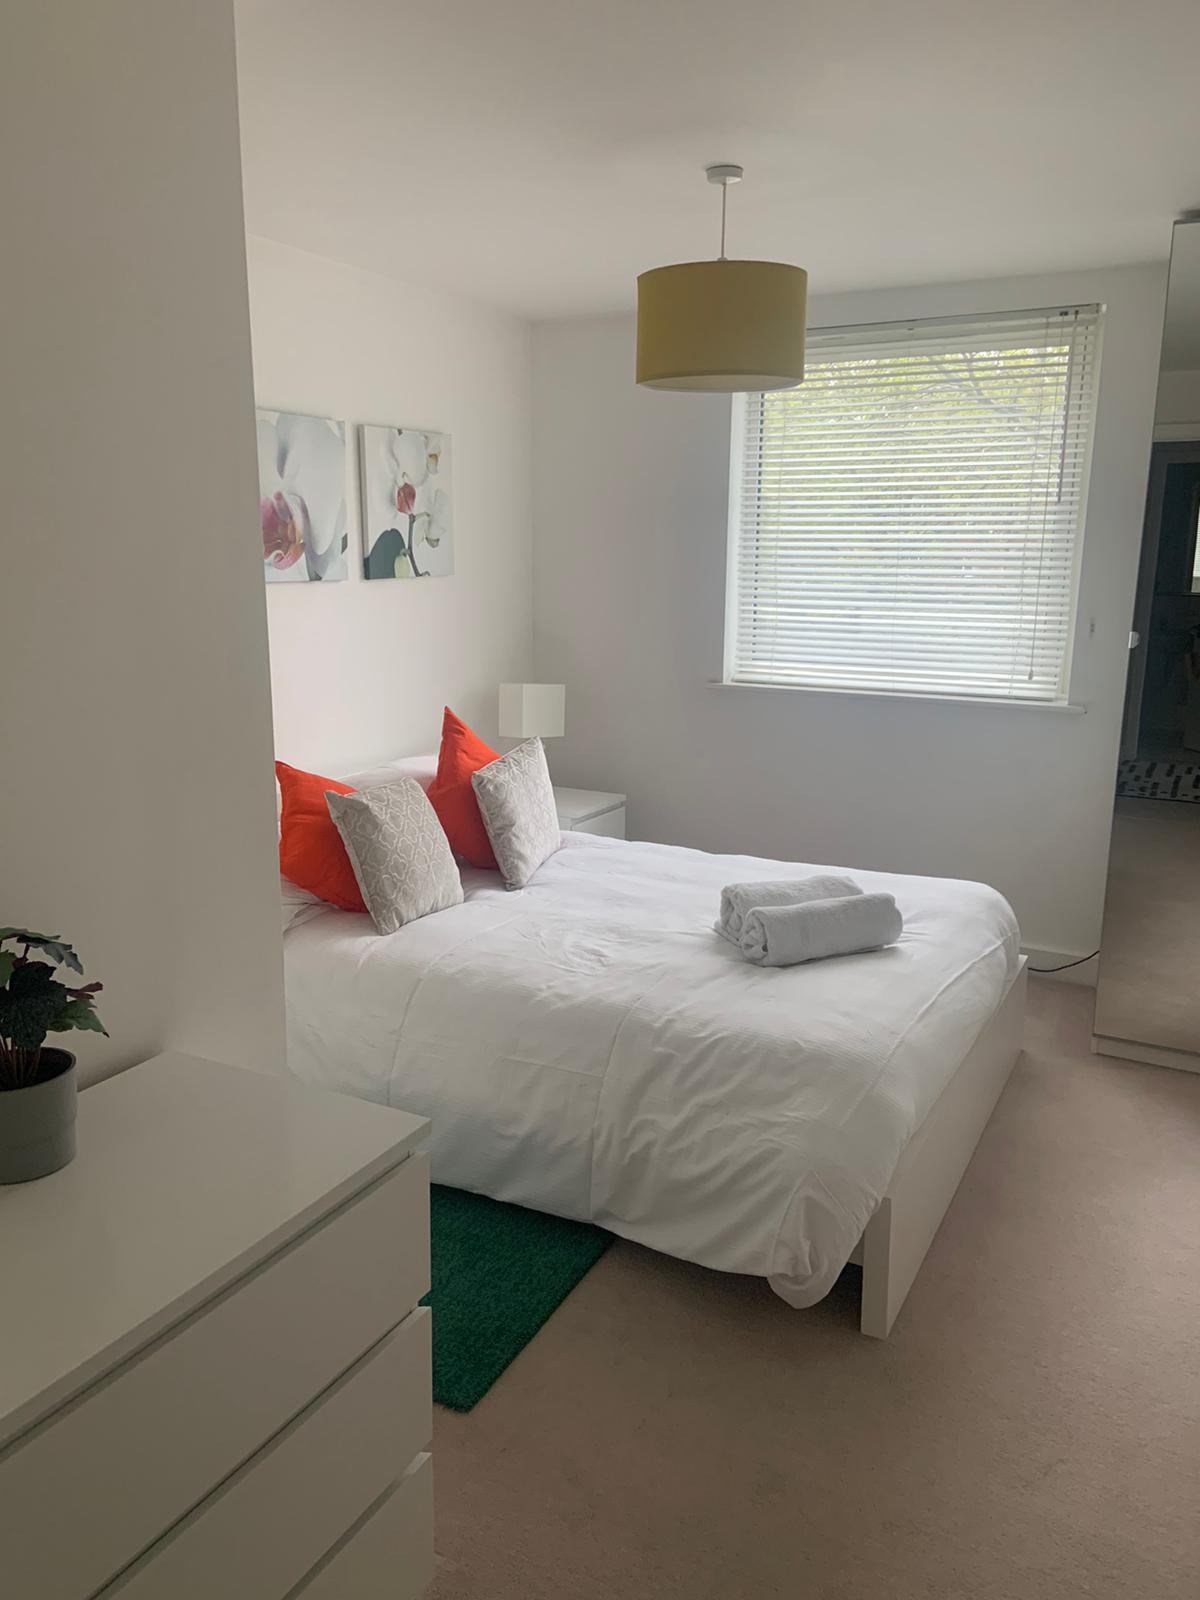 Bed linen at Ocean Village Serviced Apartments, Ocean Village, Southampton